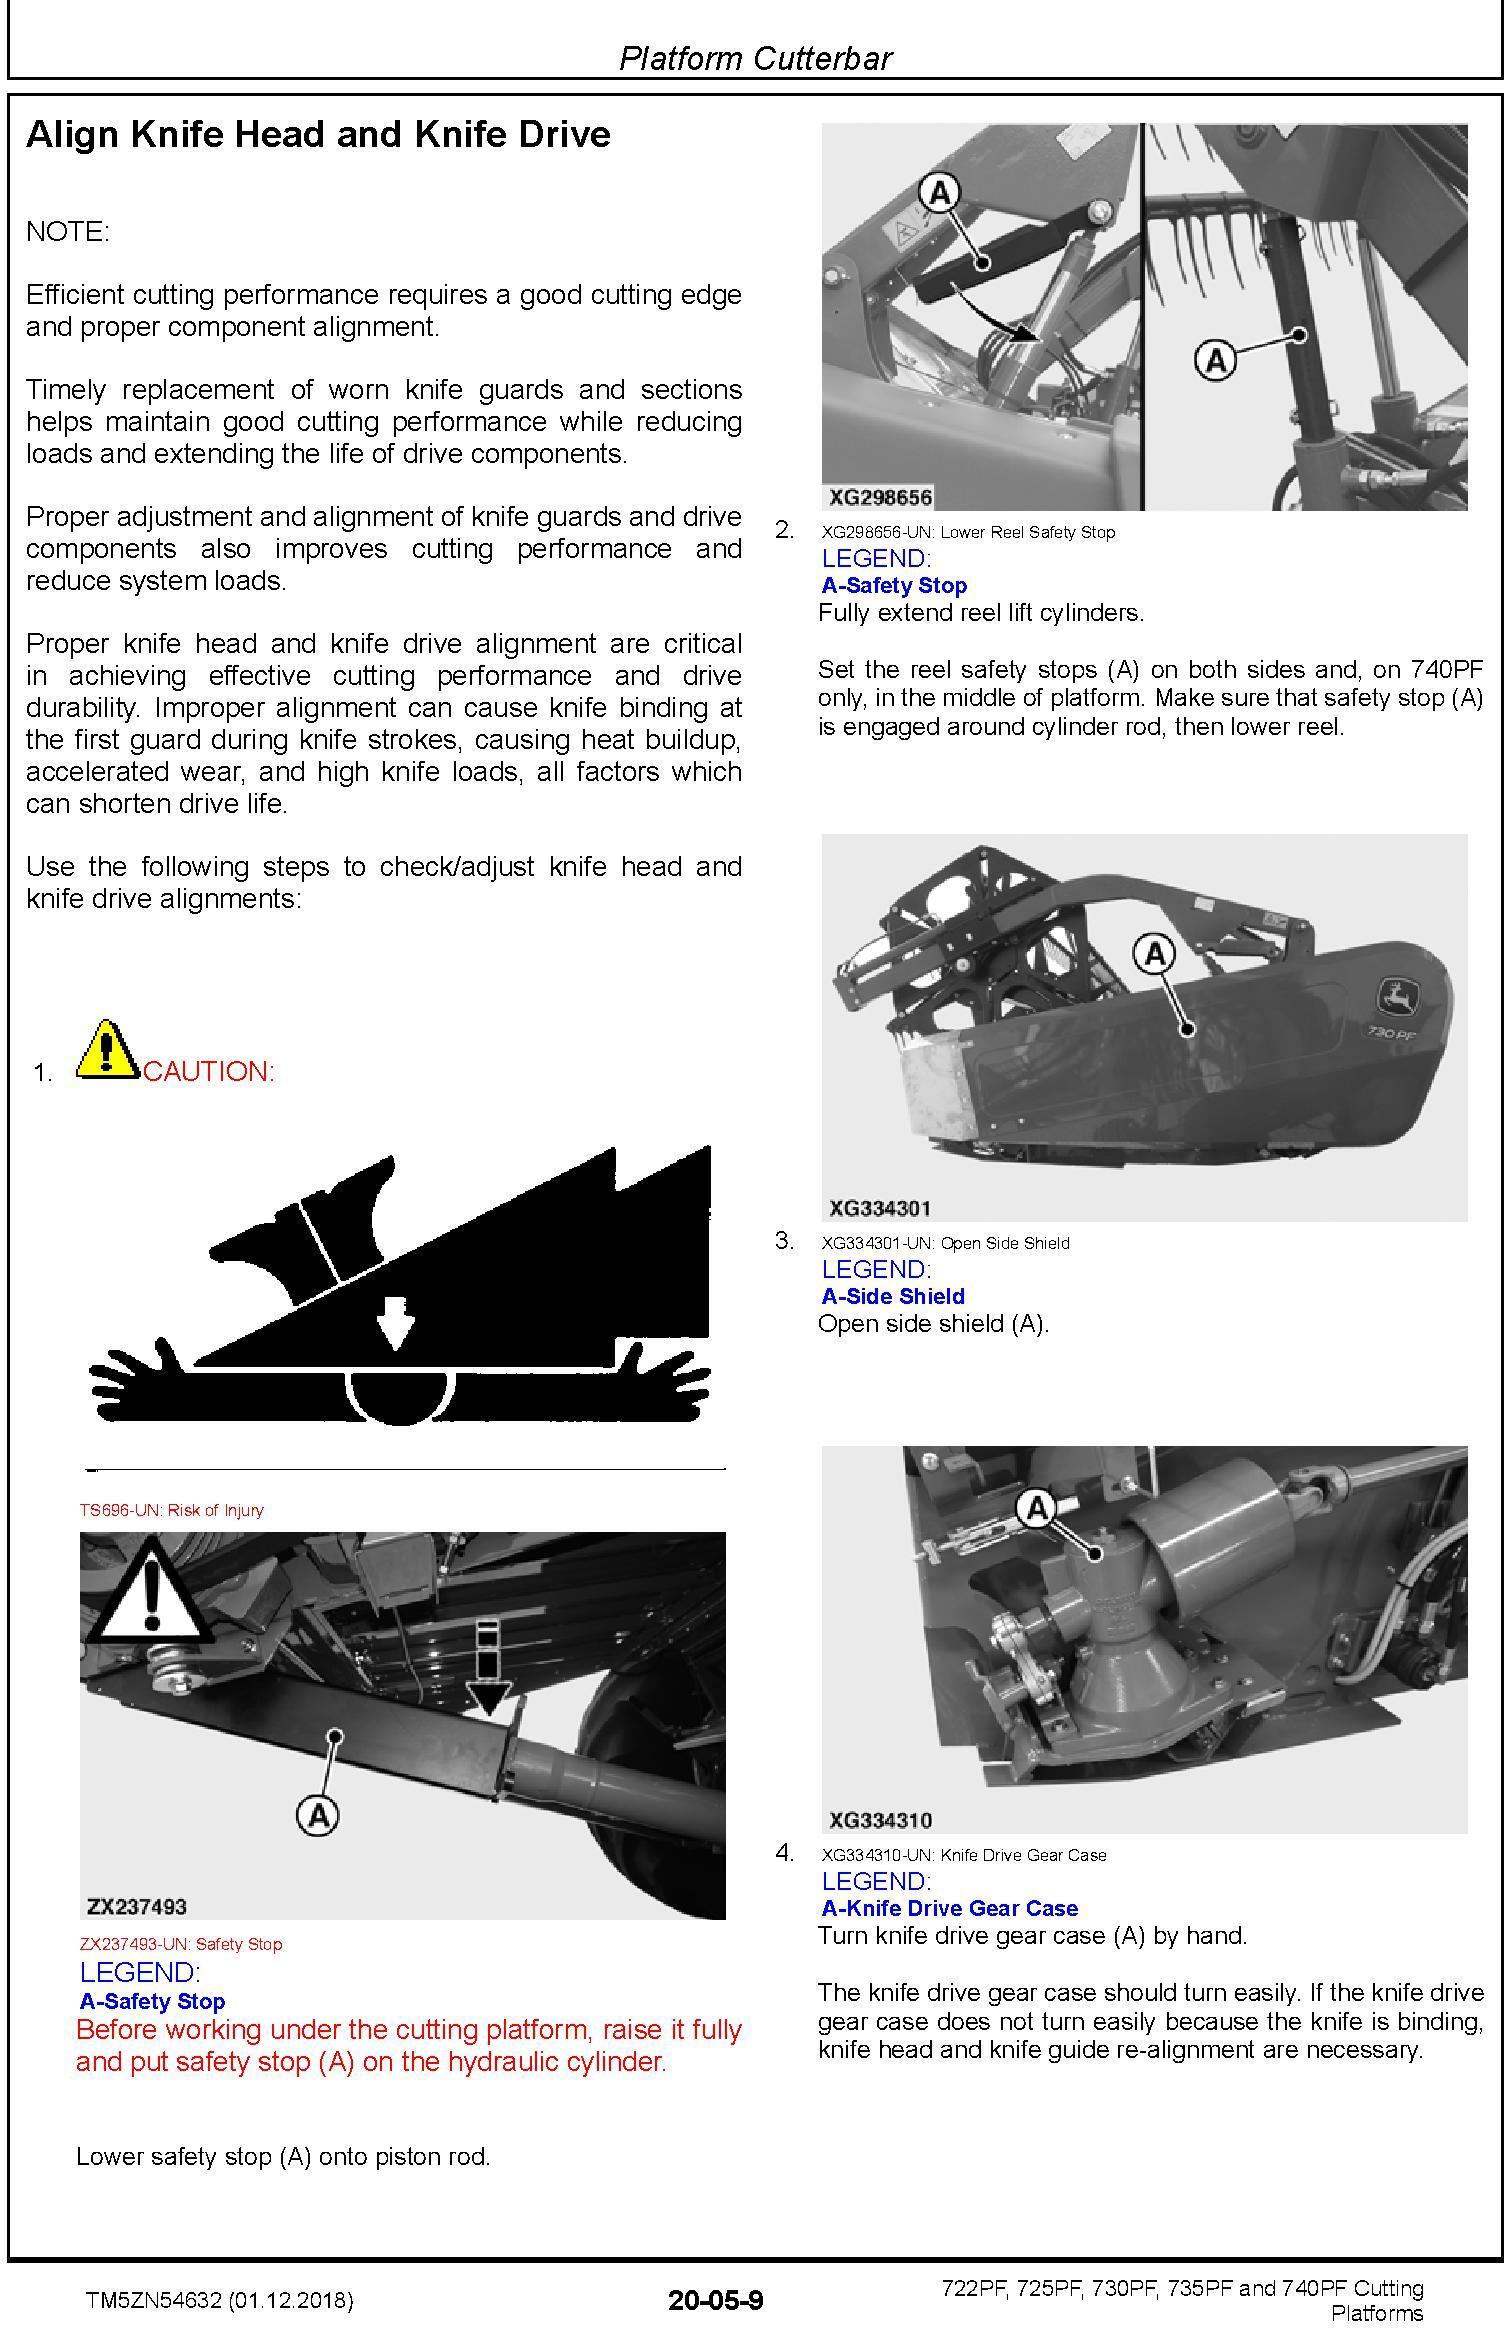 John Deere 722PF, 725PF, 730PF, 735PF and 740PF Cutting Platforms Technical Manual (TM5ZN54632) - 2